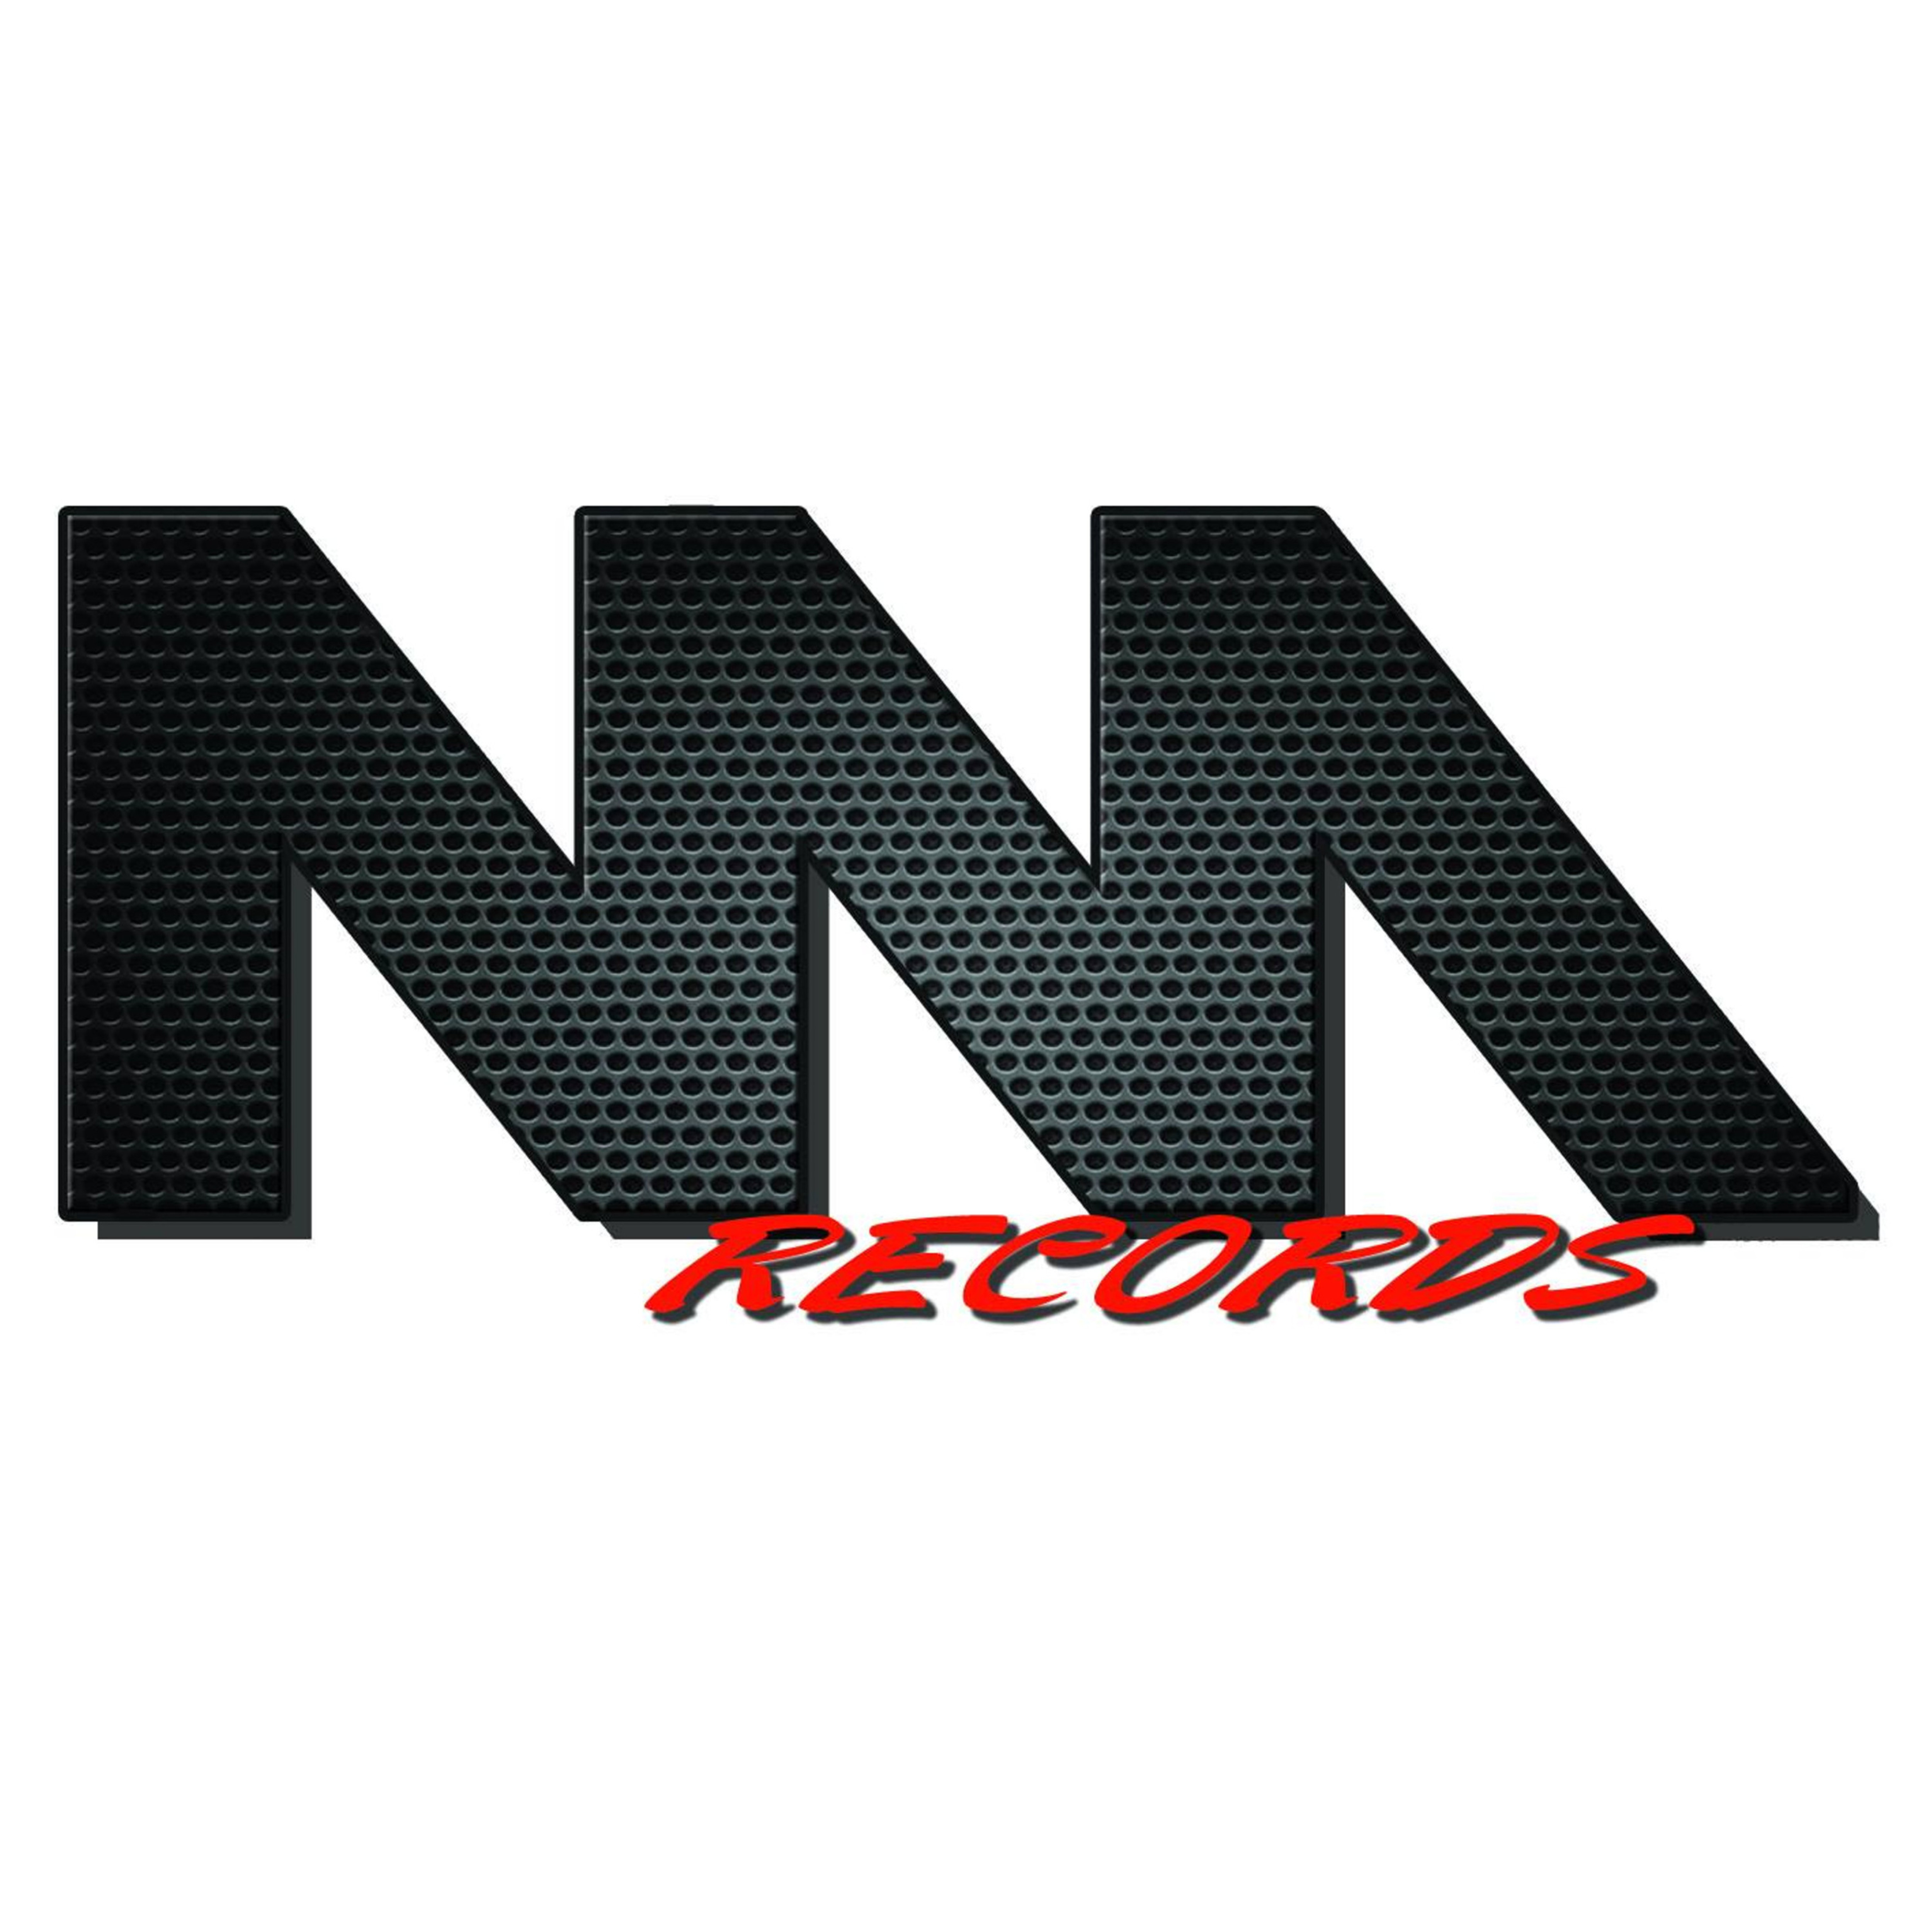 NM Records